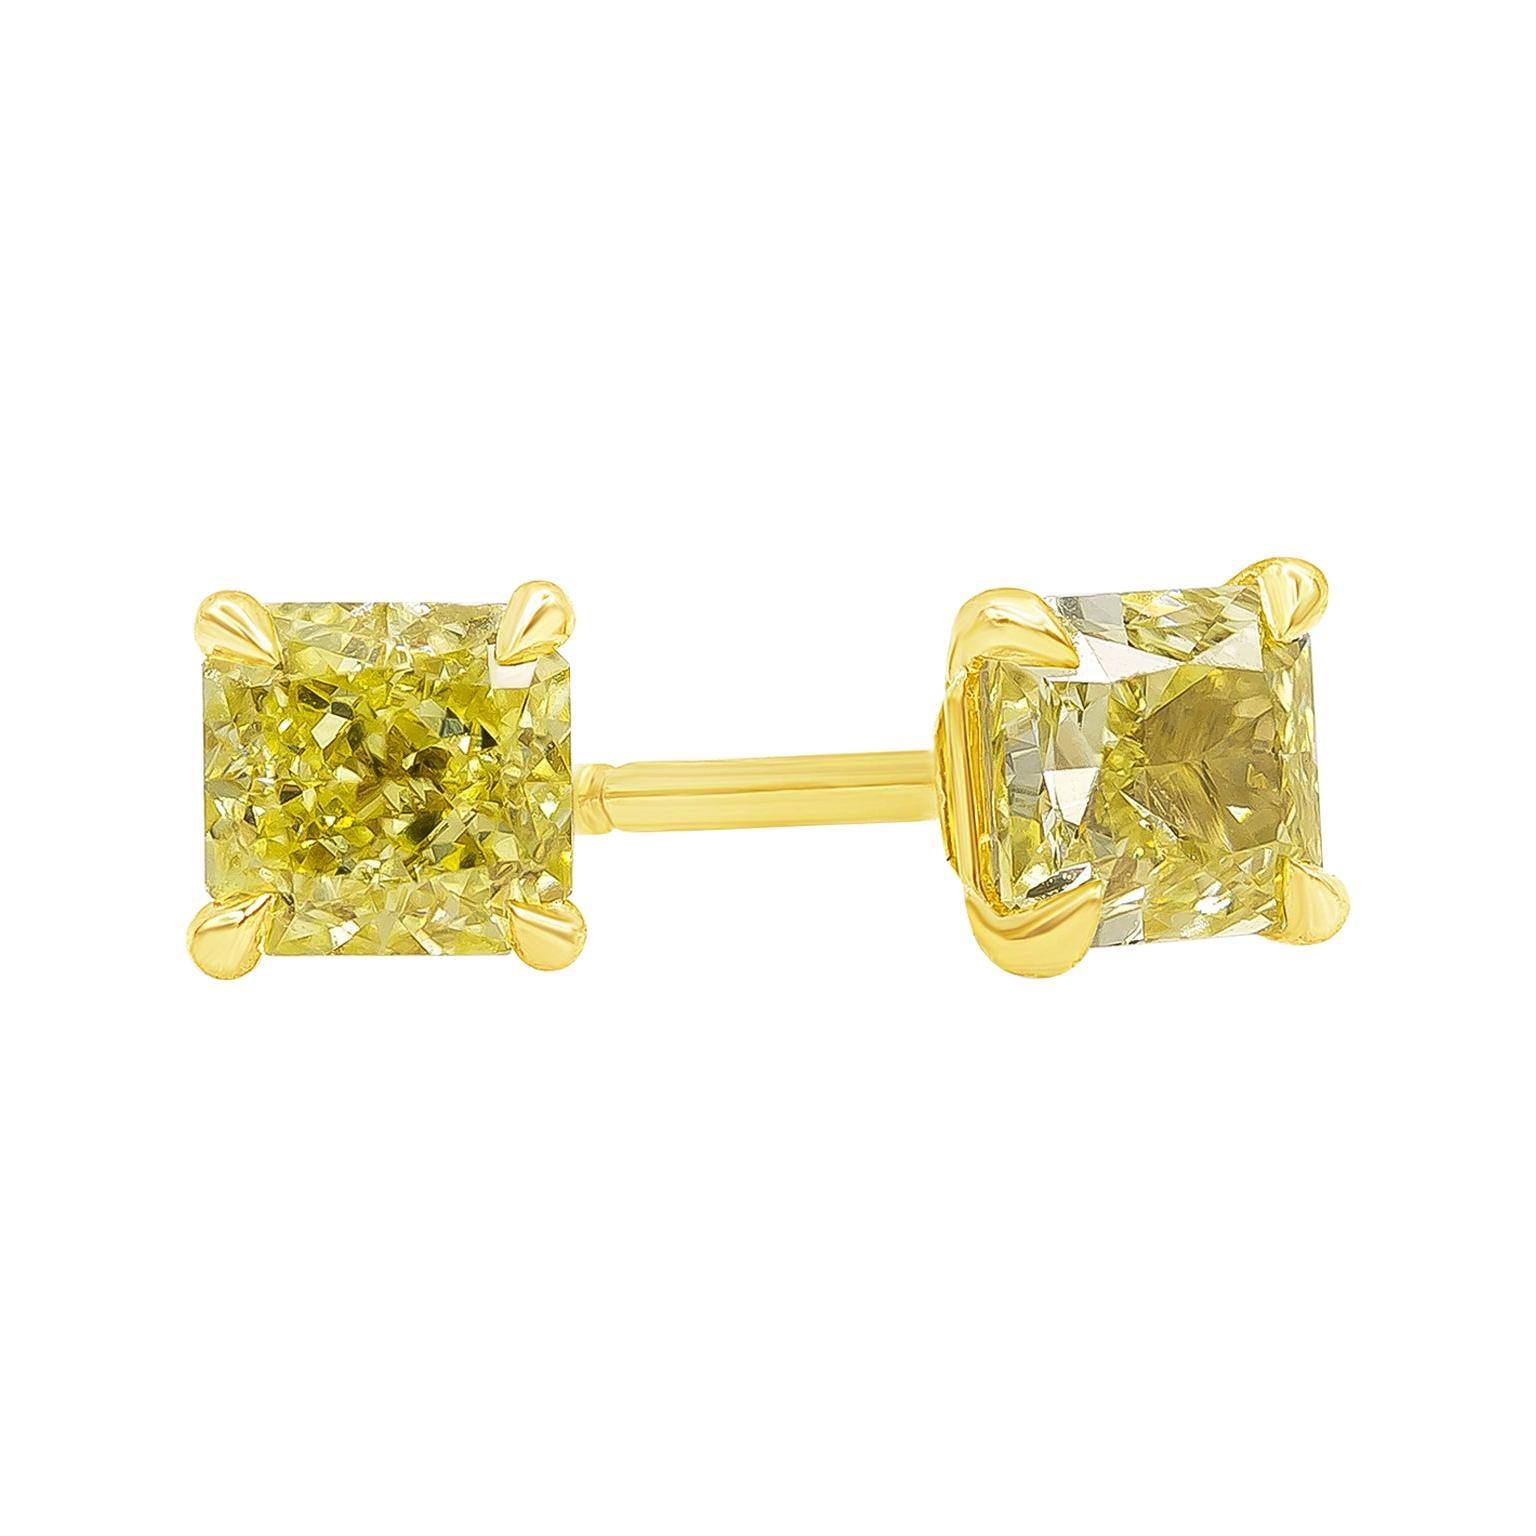 Roman Malakov, GIA Certified Intense Yellow Radiant Cut Diamond Stud Earrings